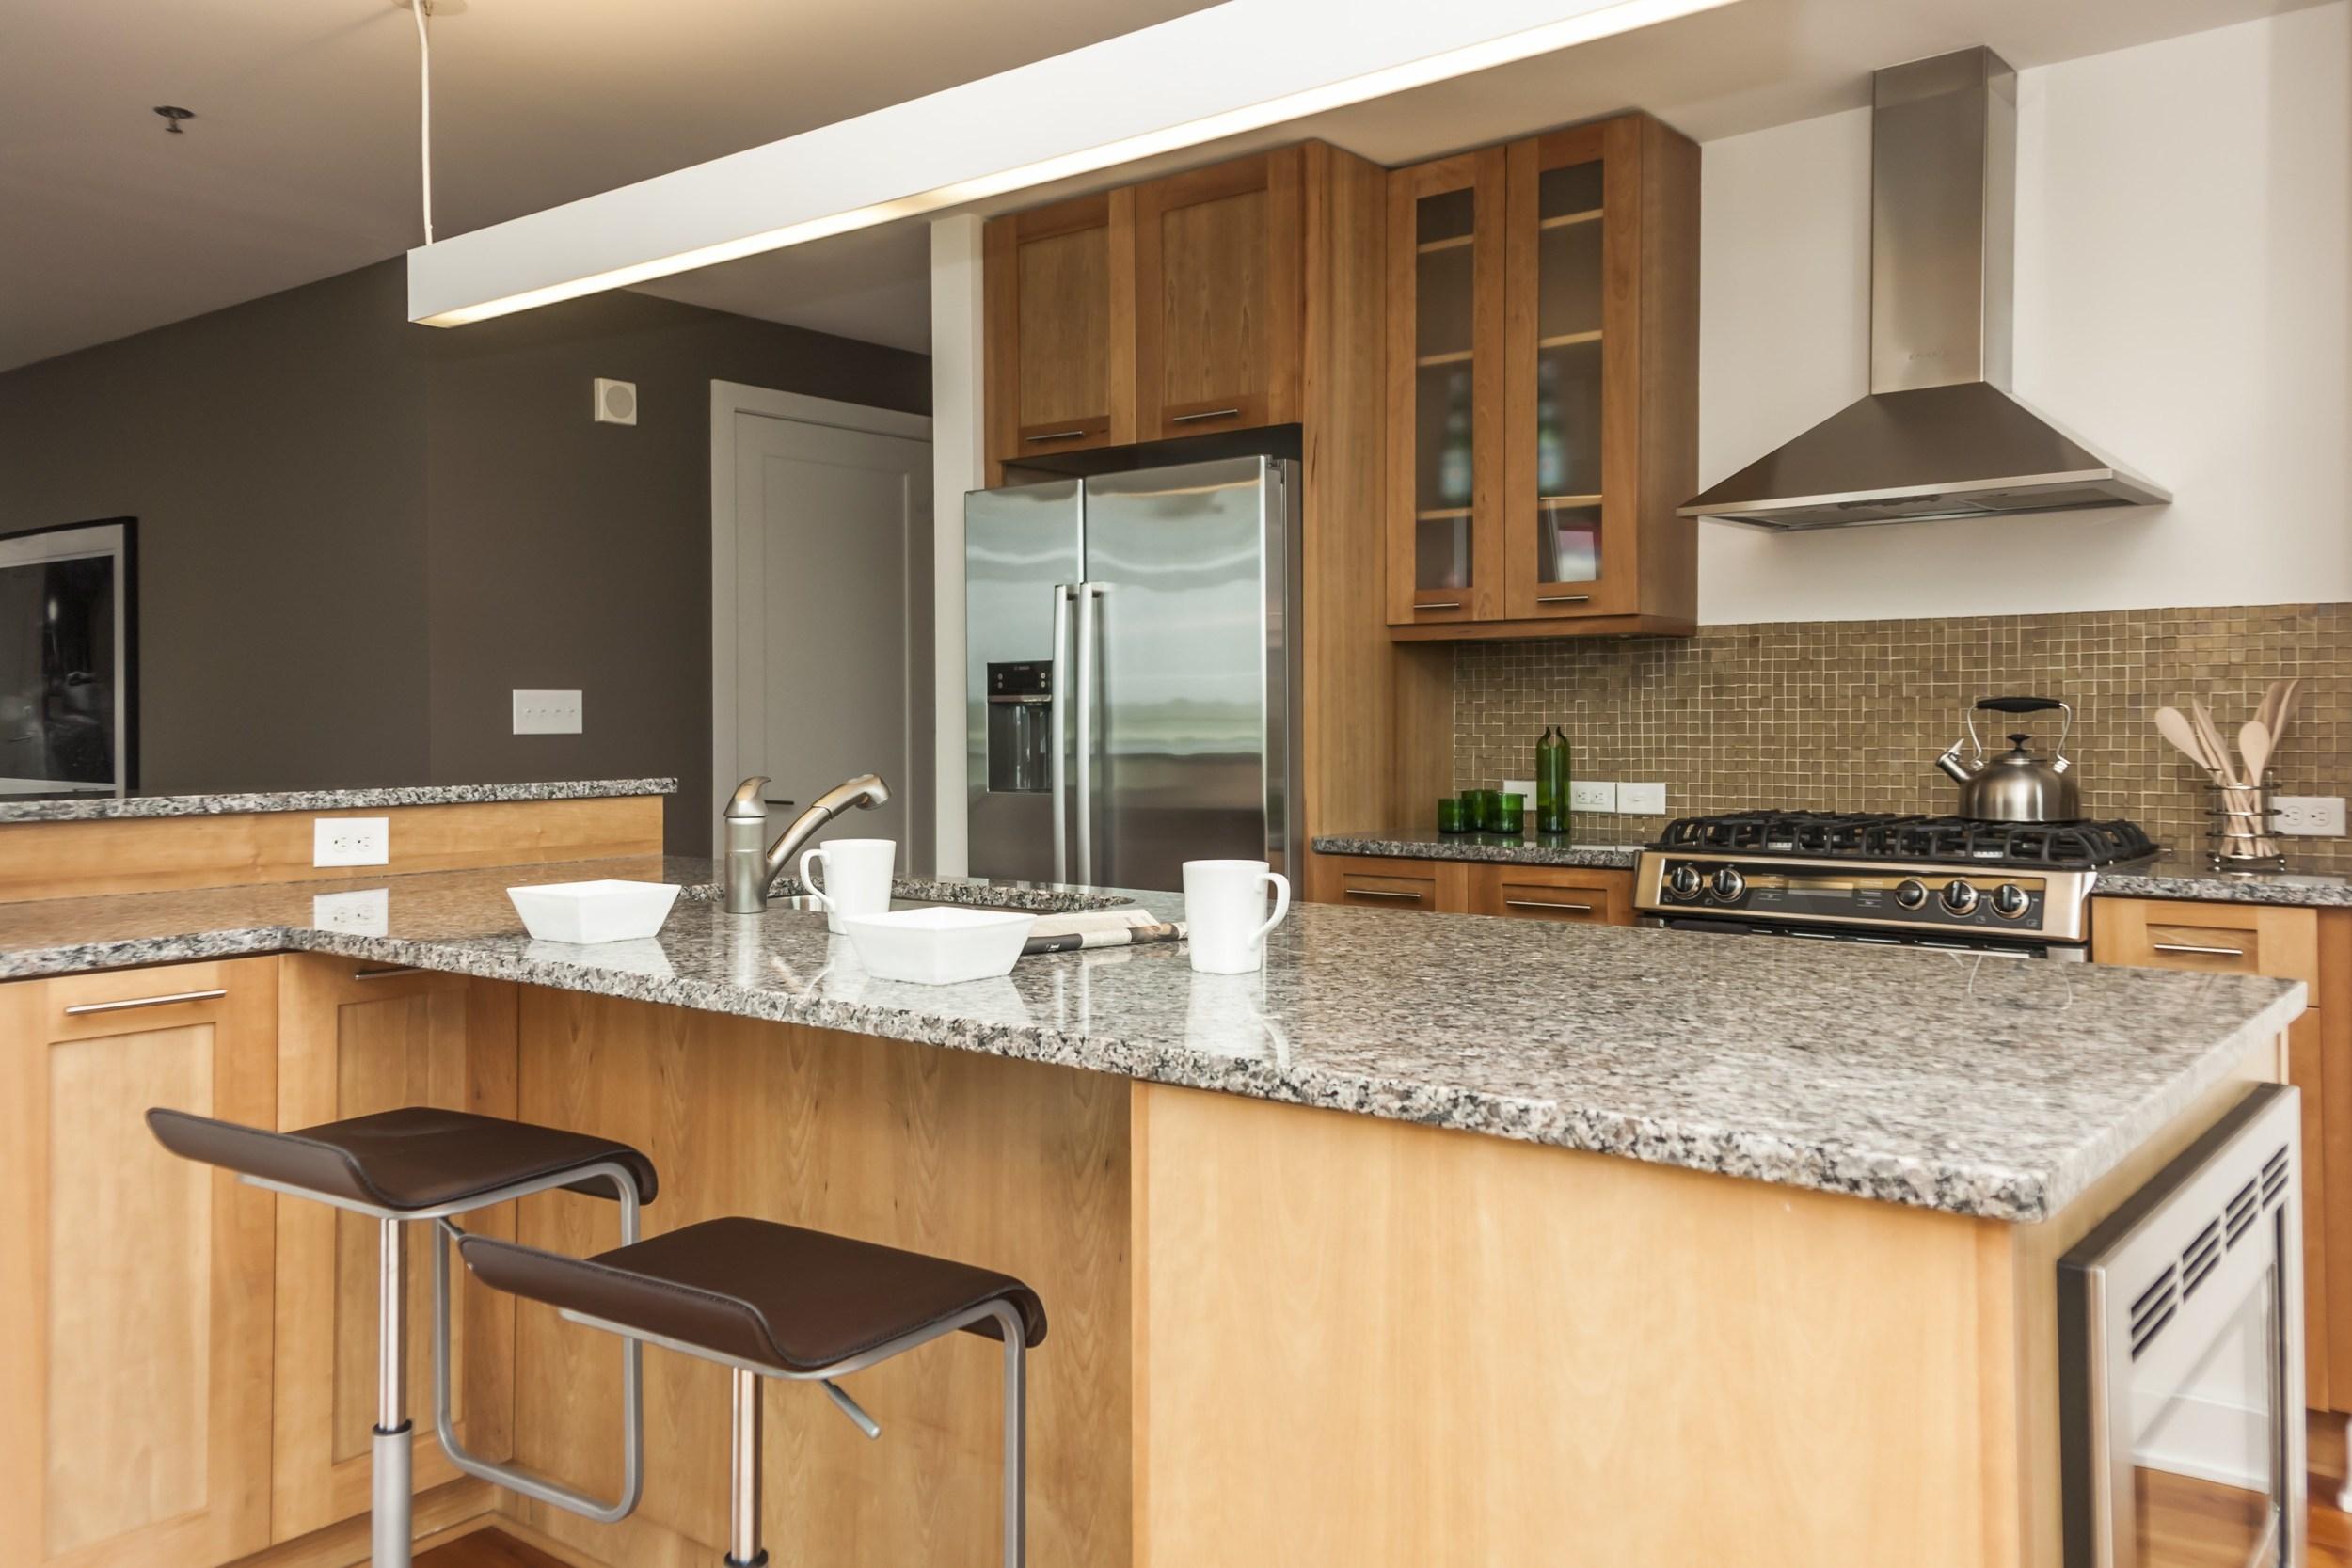 028_Model Home # 804 Kitchen.jpg